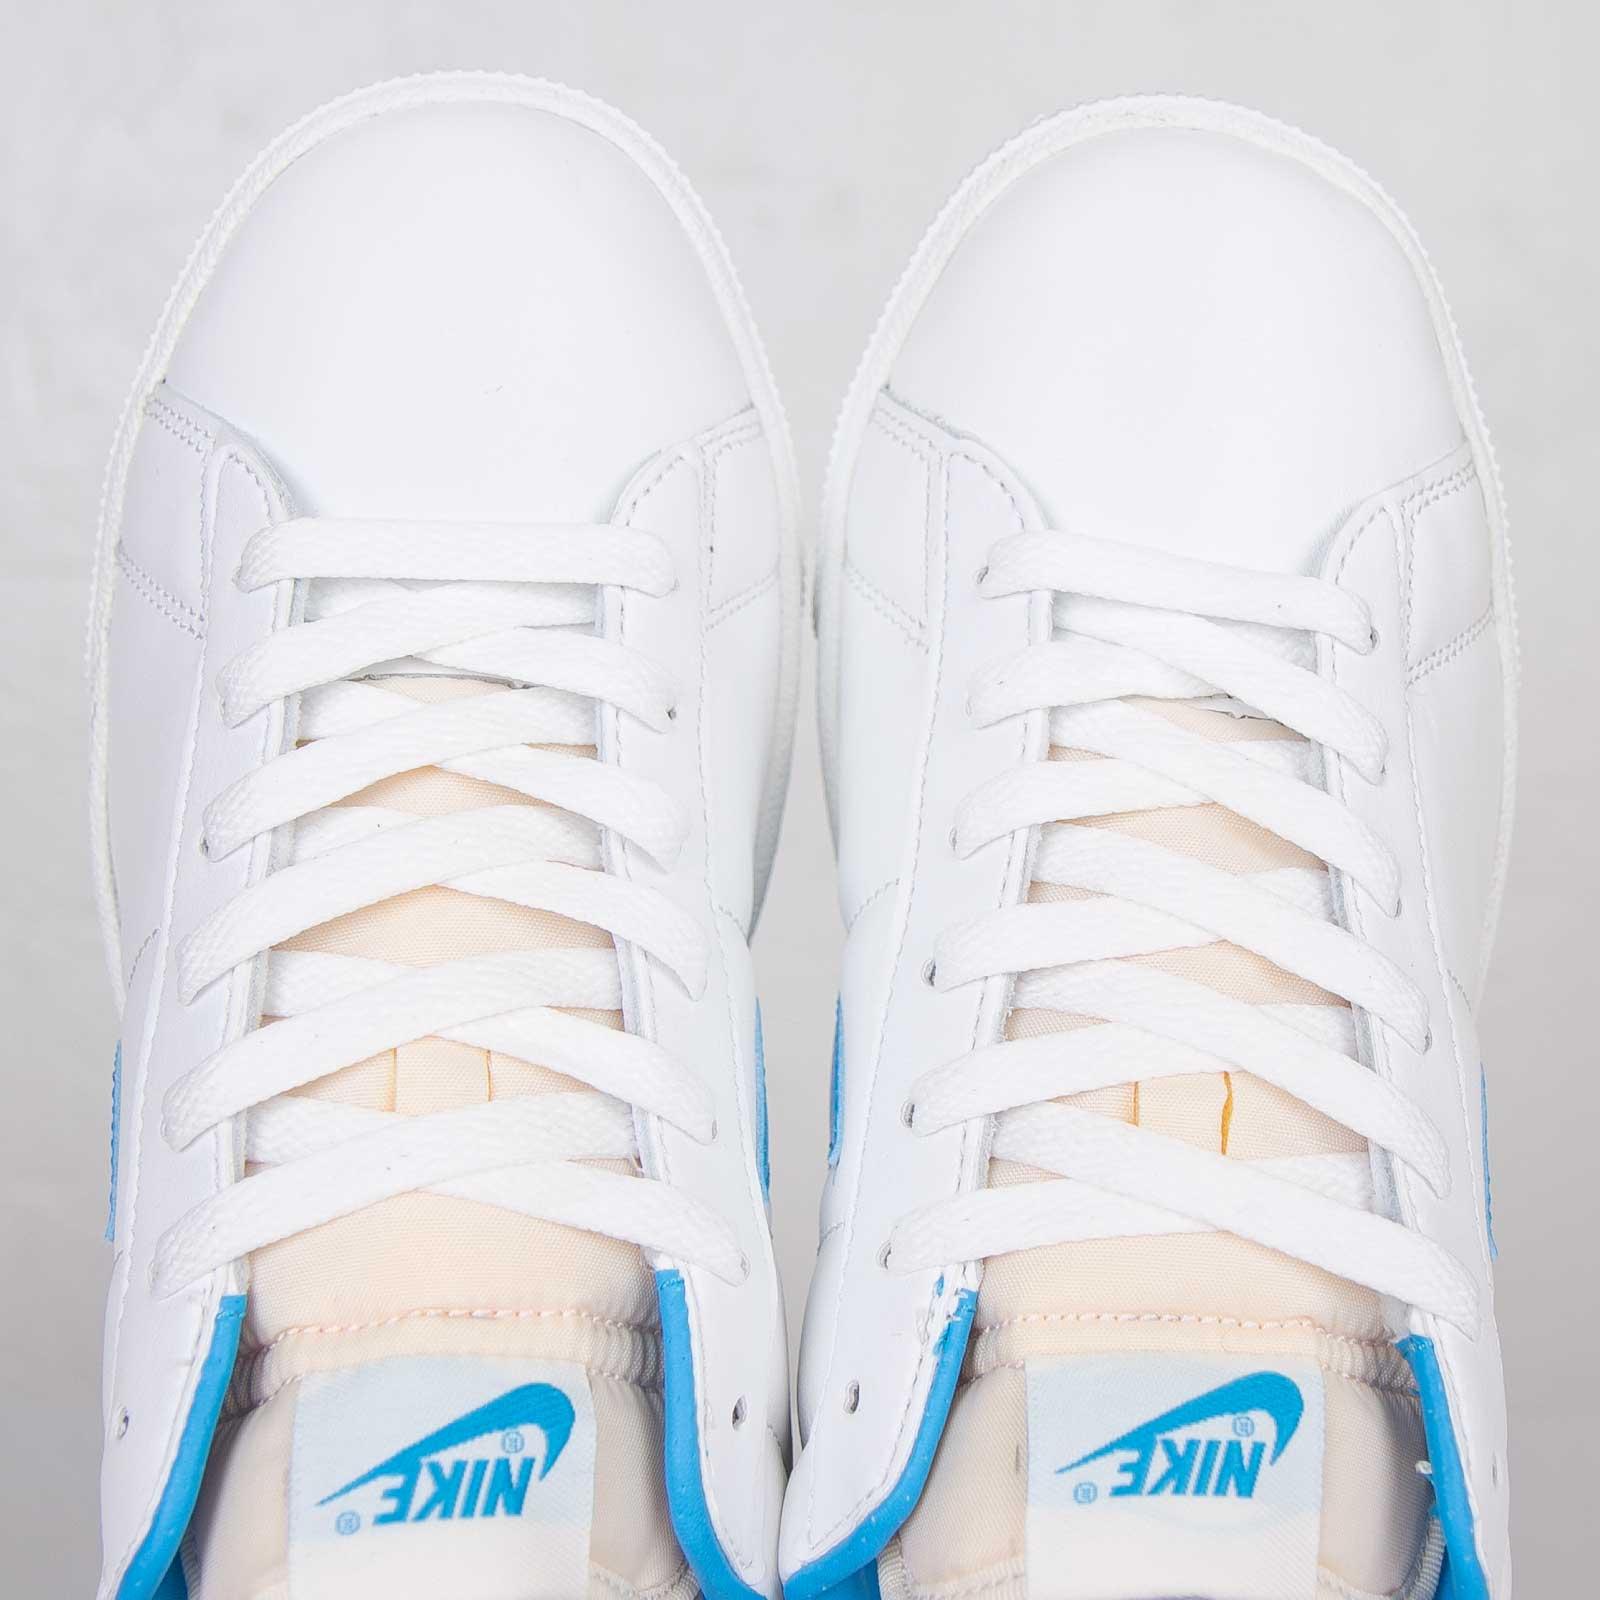 Componer Marchitar favorito  Nike Tennis Classic RM - 631692-140 - Sneakersnstuff | sneakers &  streetwear online since 1999